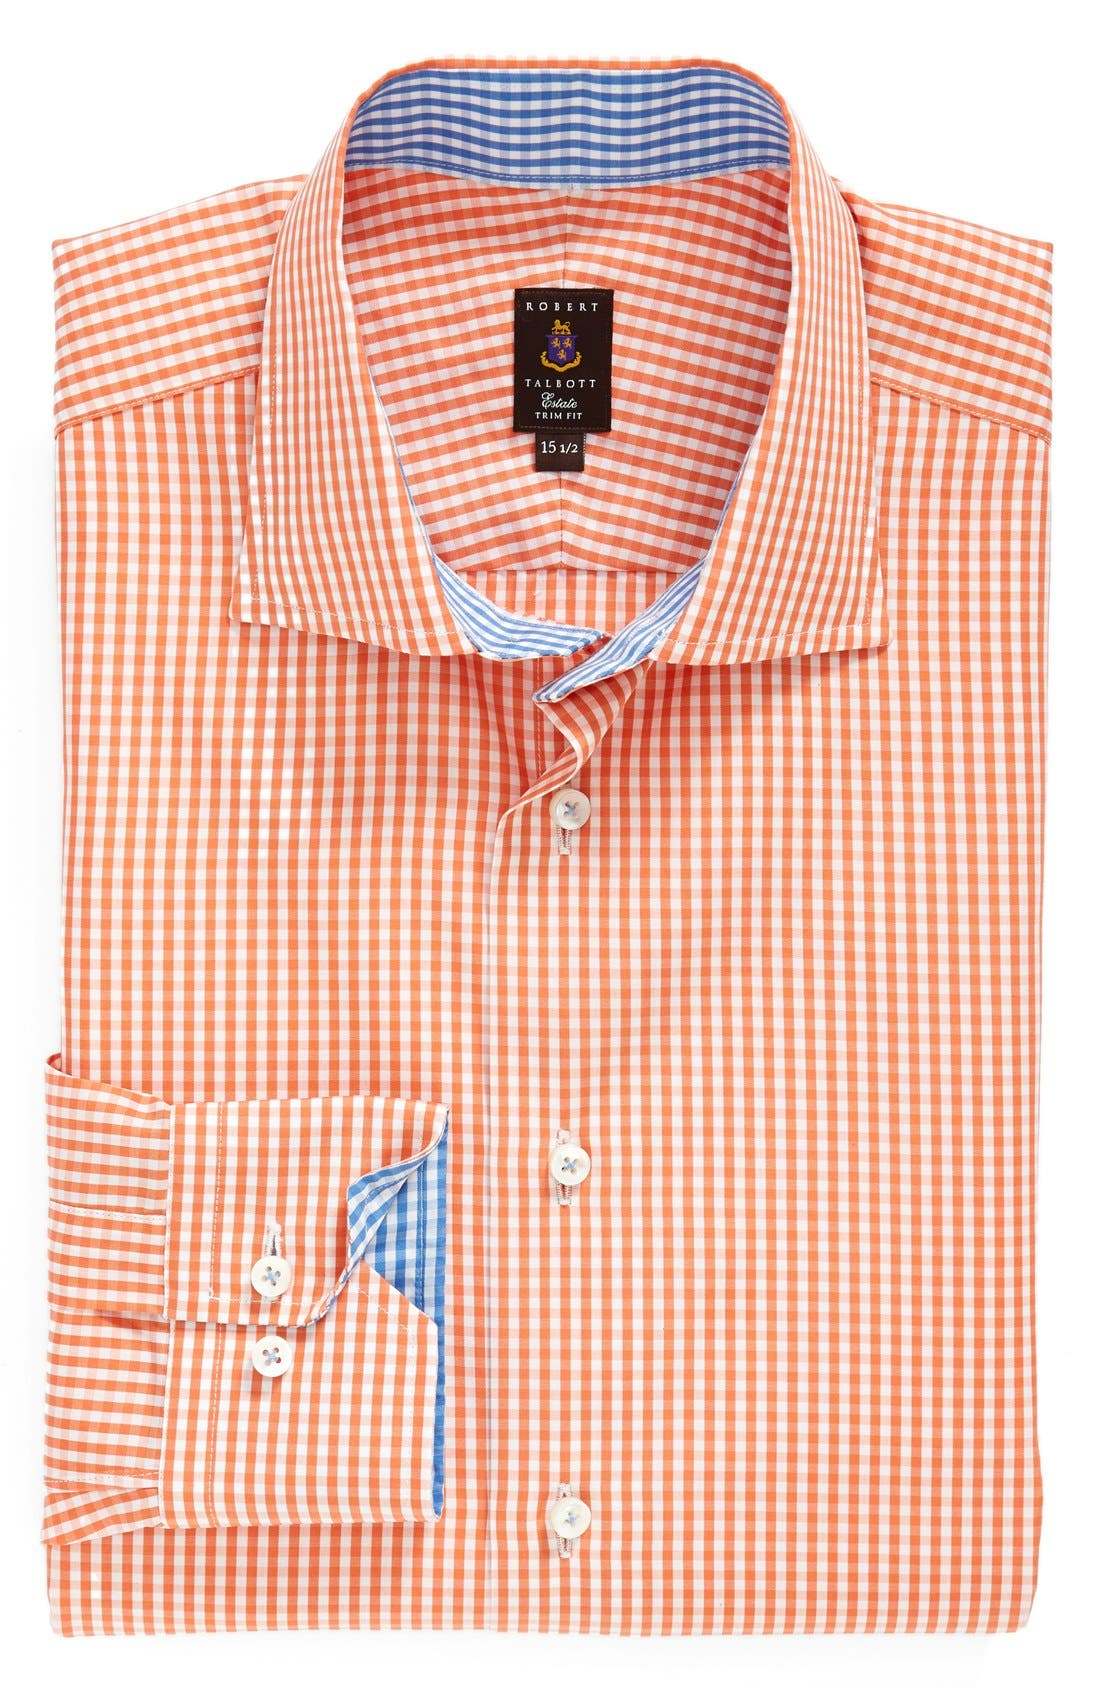 Alternate Image 1 Selected - Robert Talbott Trim Fit Check Dress Shirt